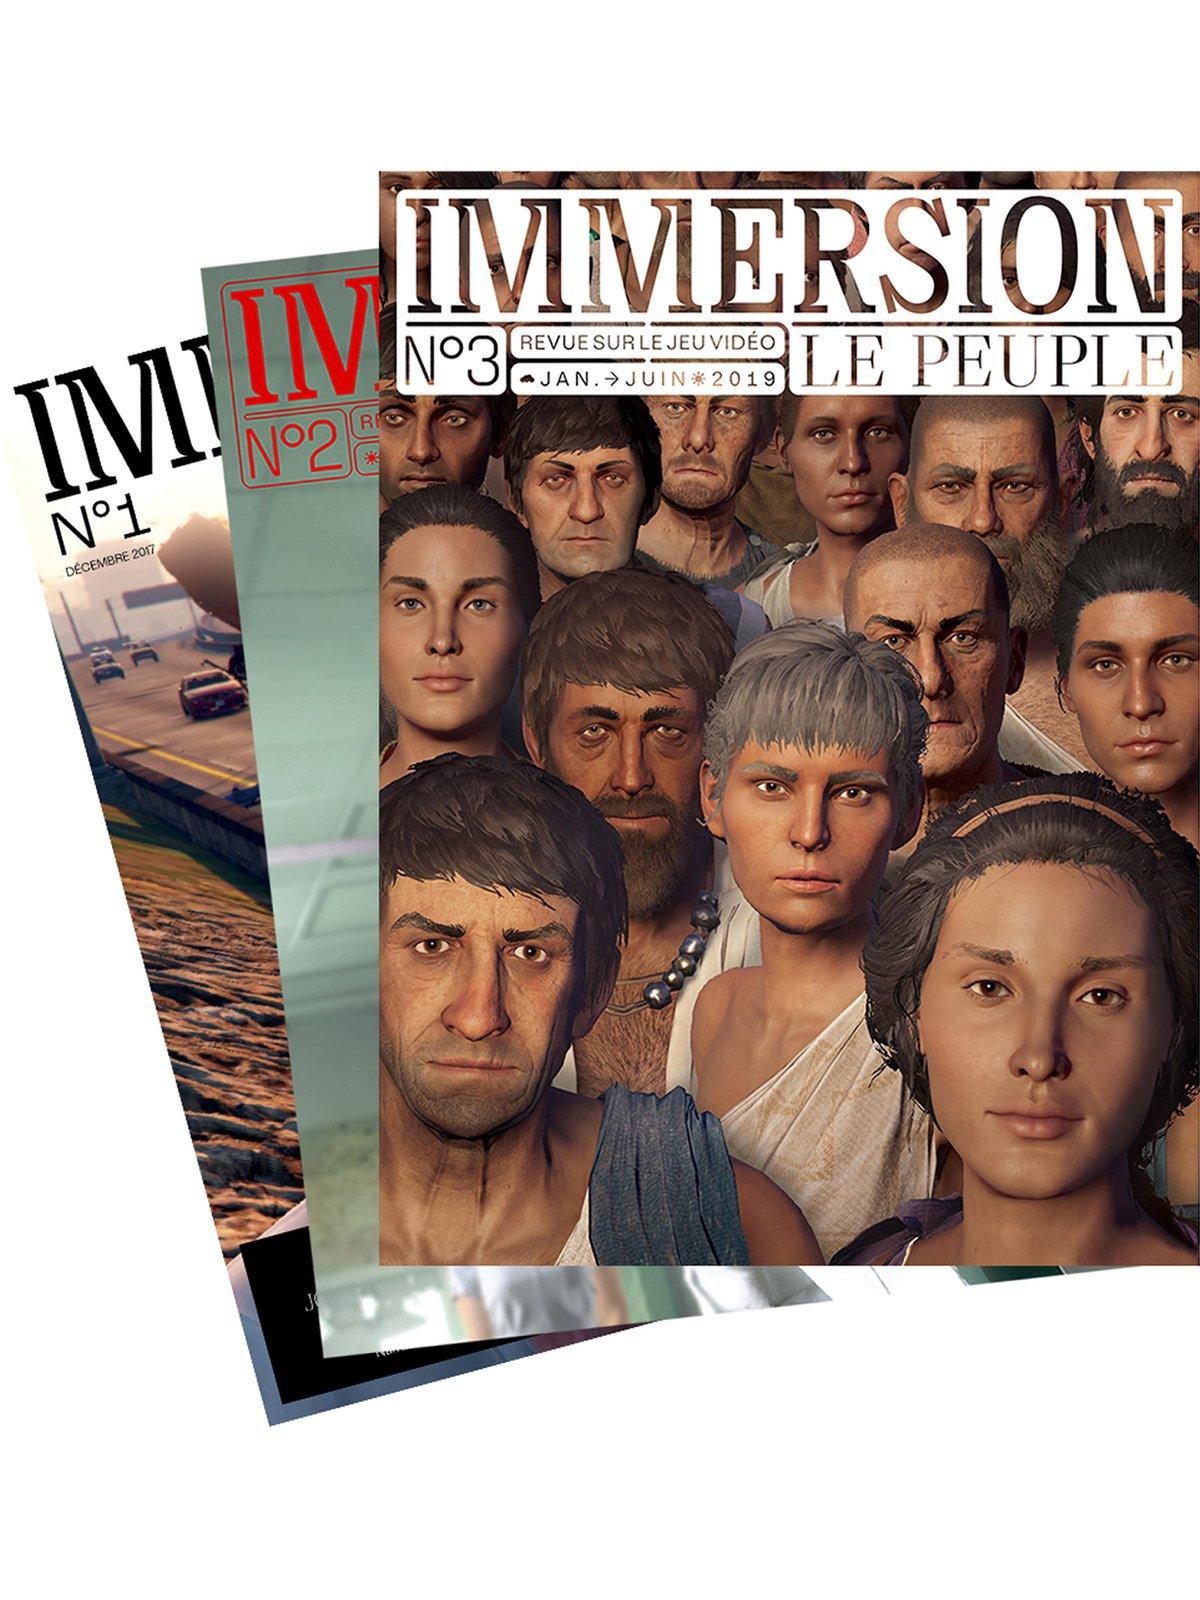 Image of IMMERSION megapack / TROIS NUMÉROS